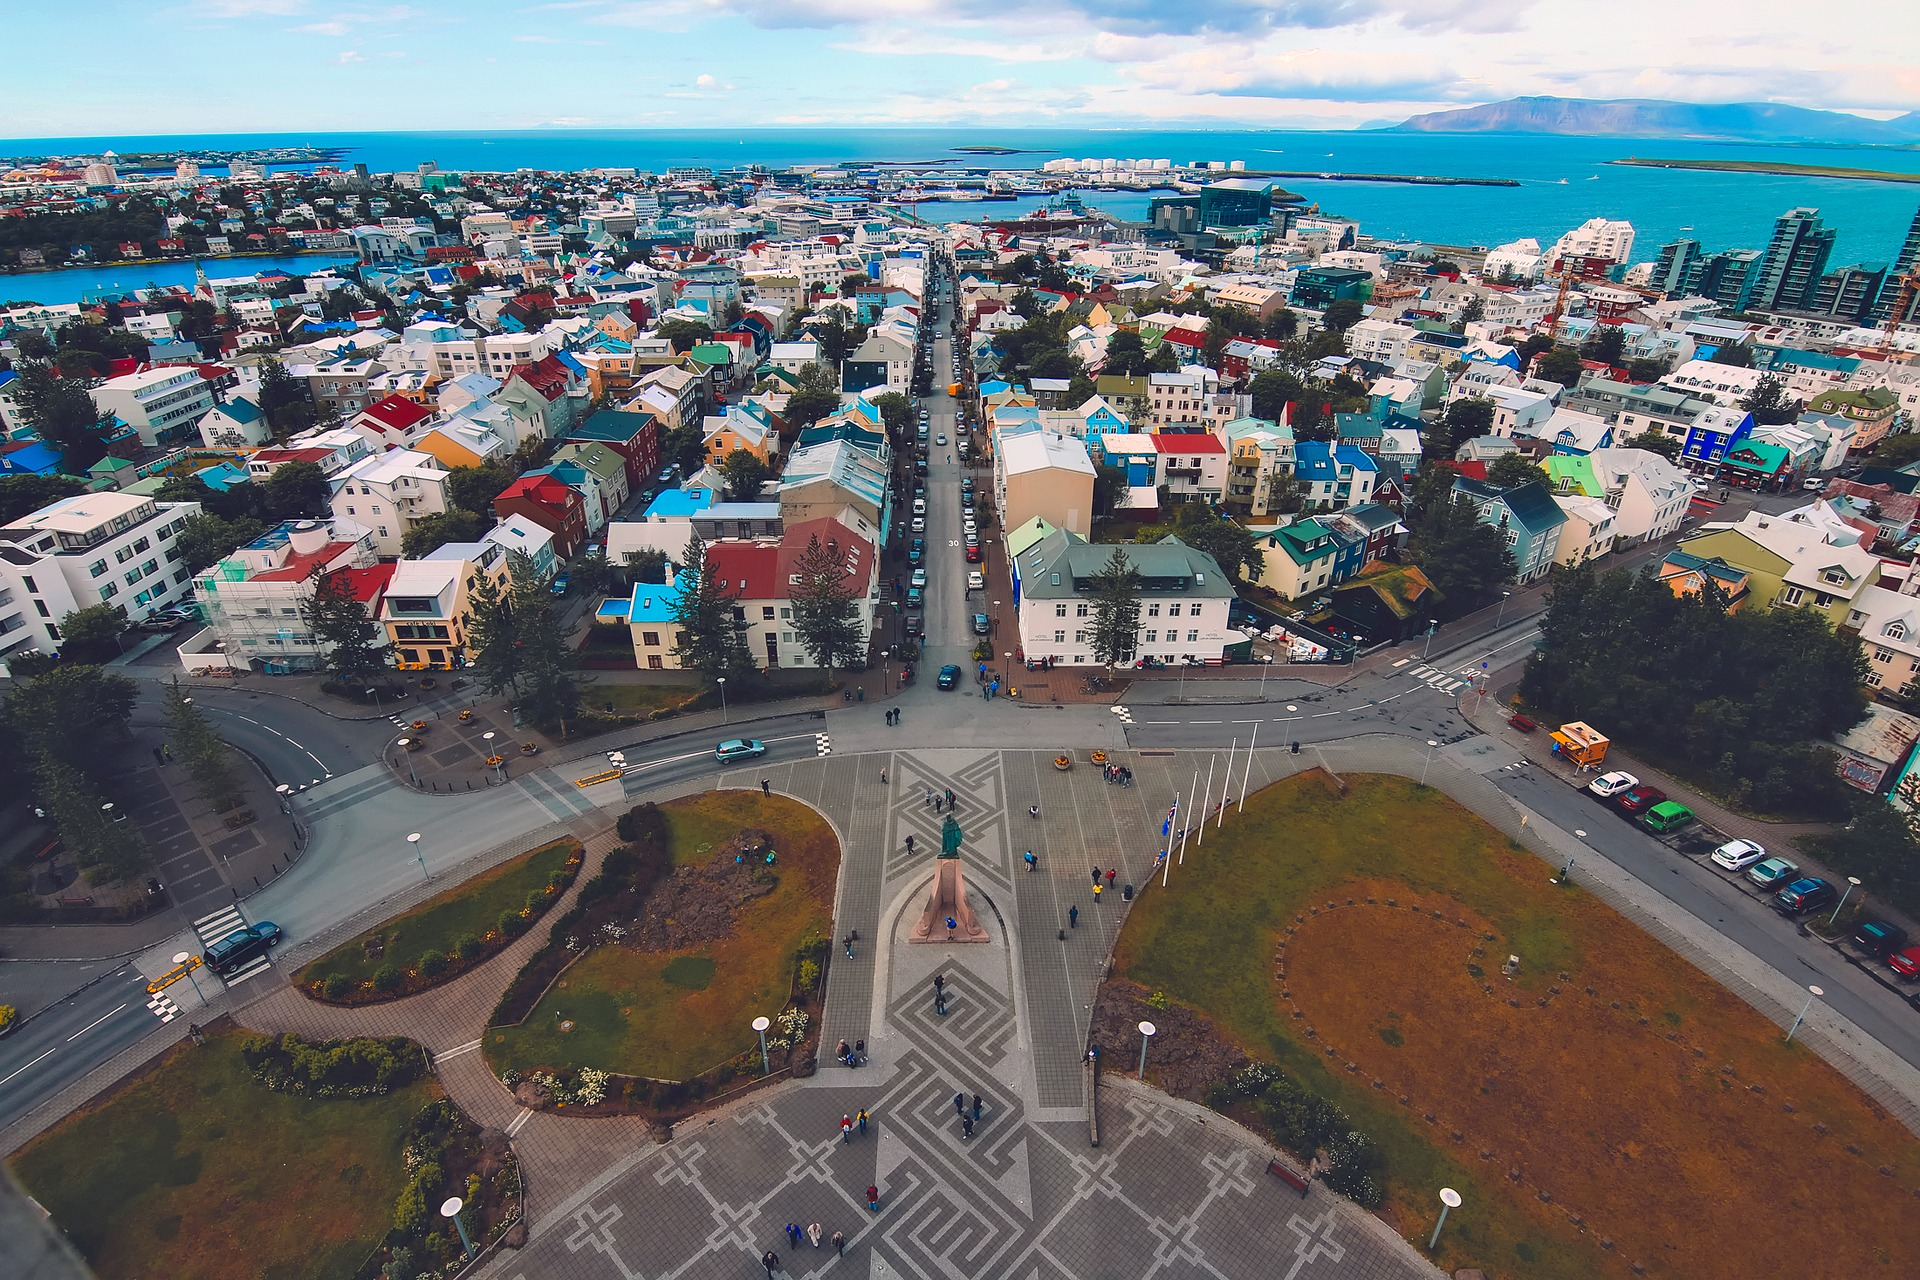 reykjavik-1988082_1920.jpg